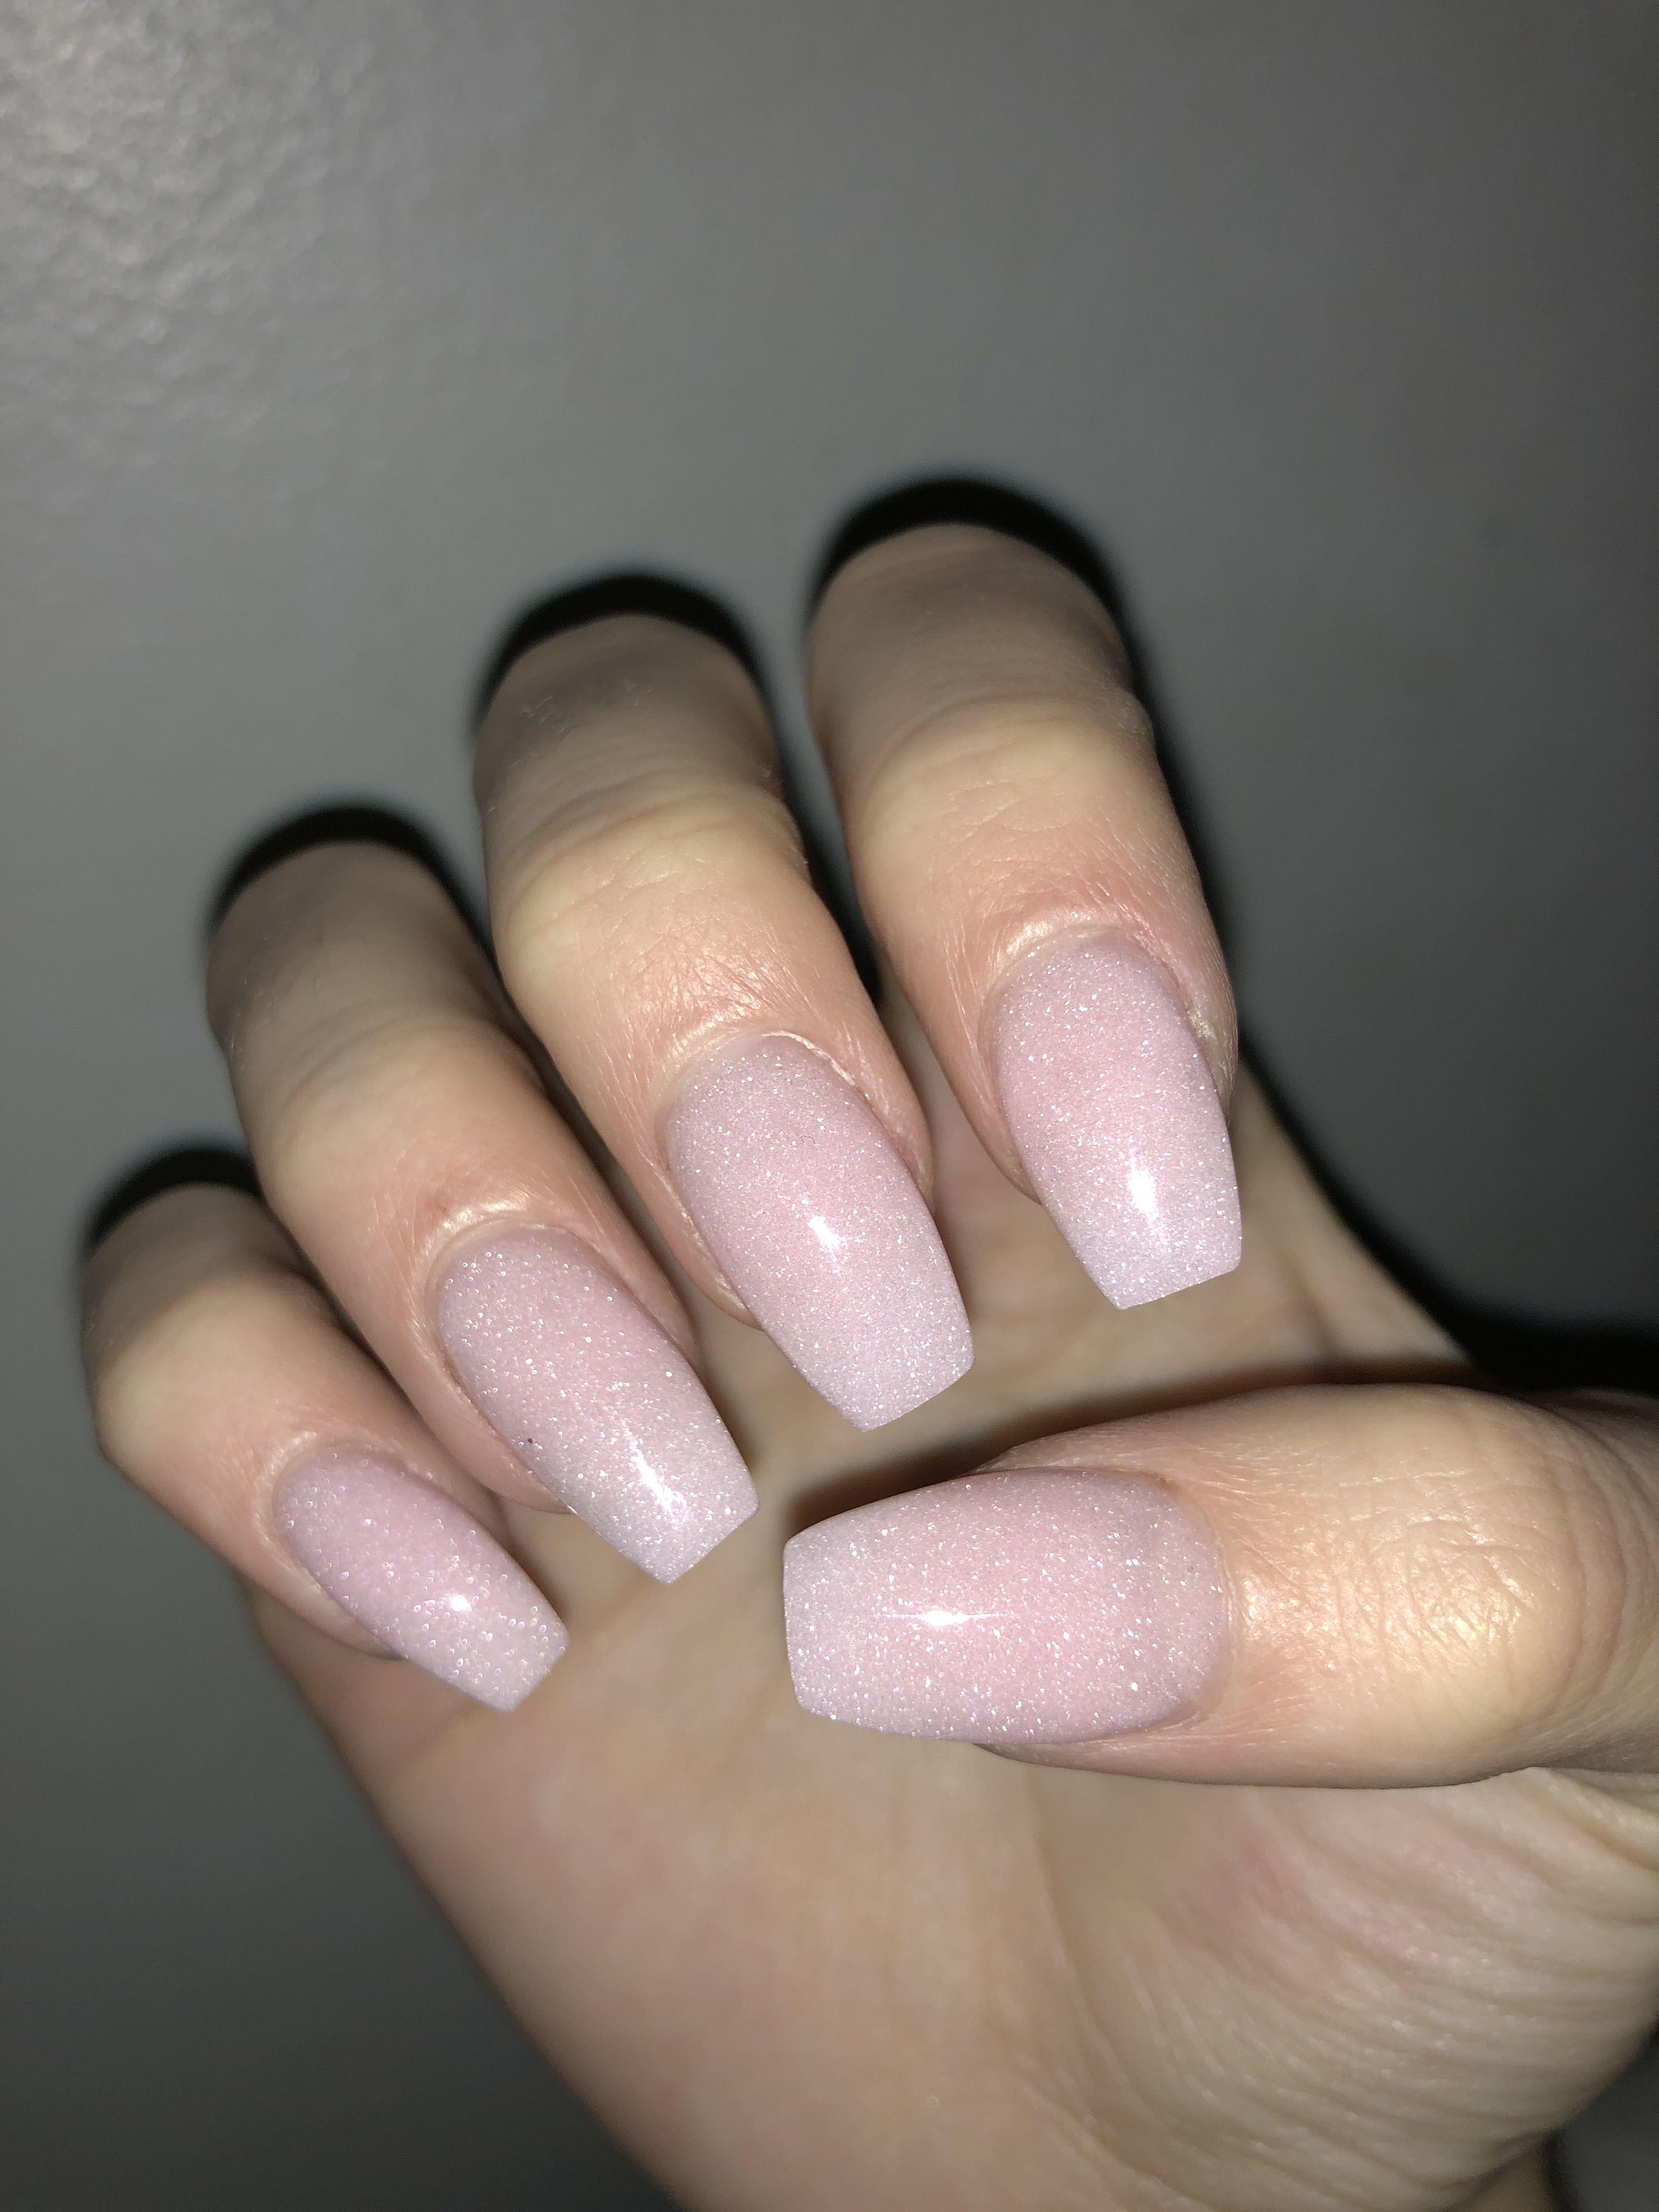 Pin by zaria lexie on nail design pinterest nail nail nails